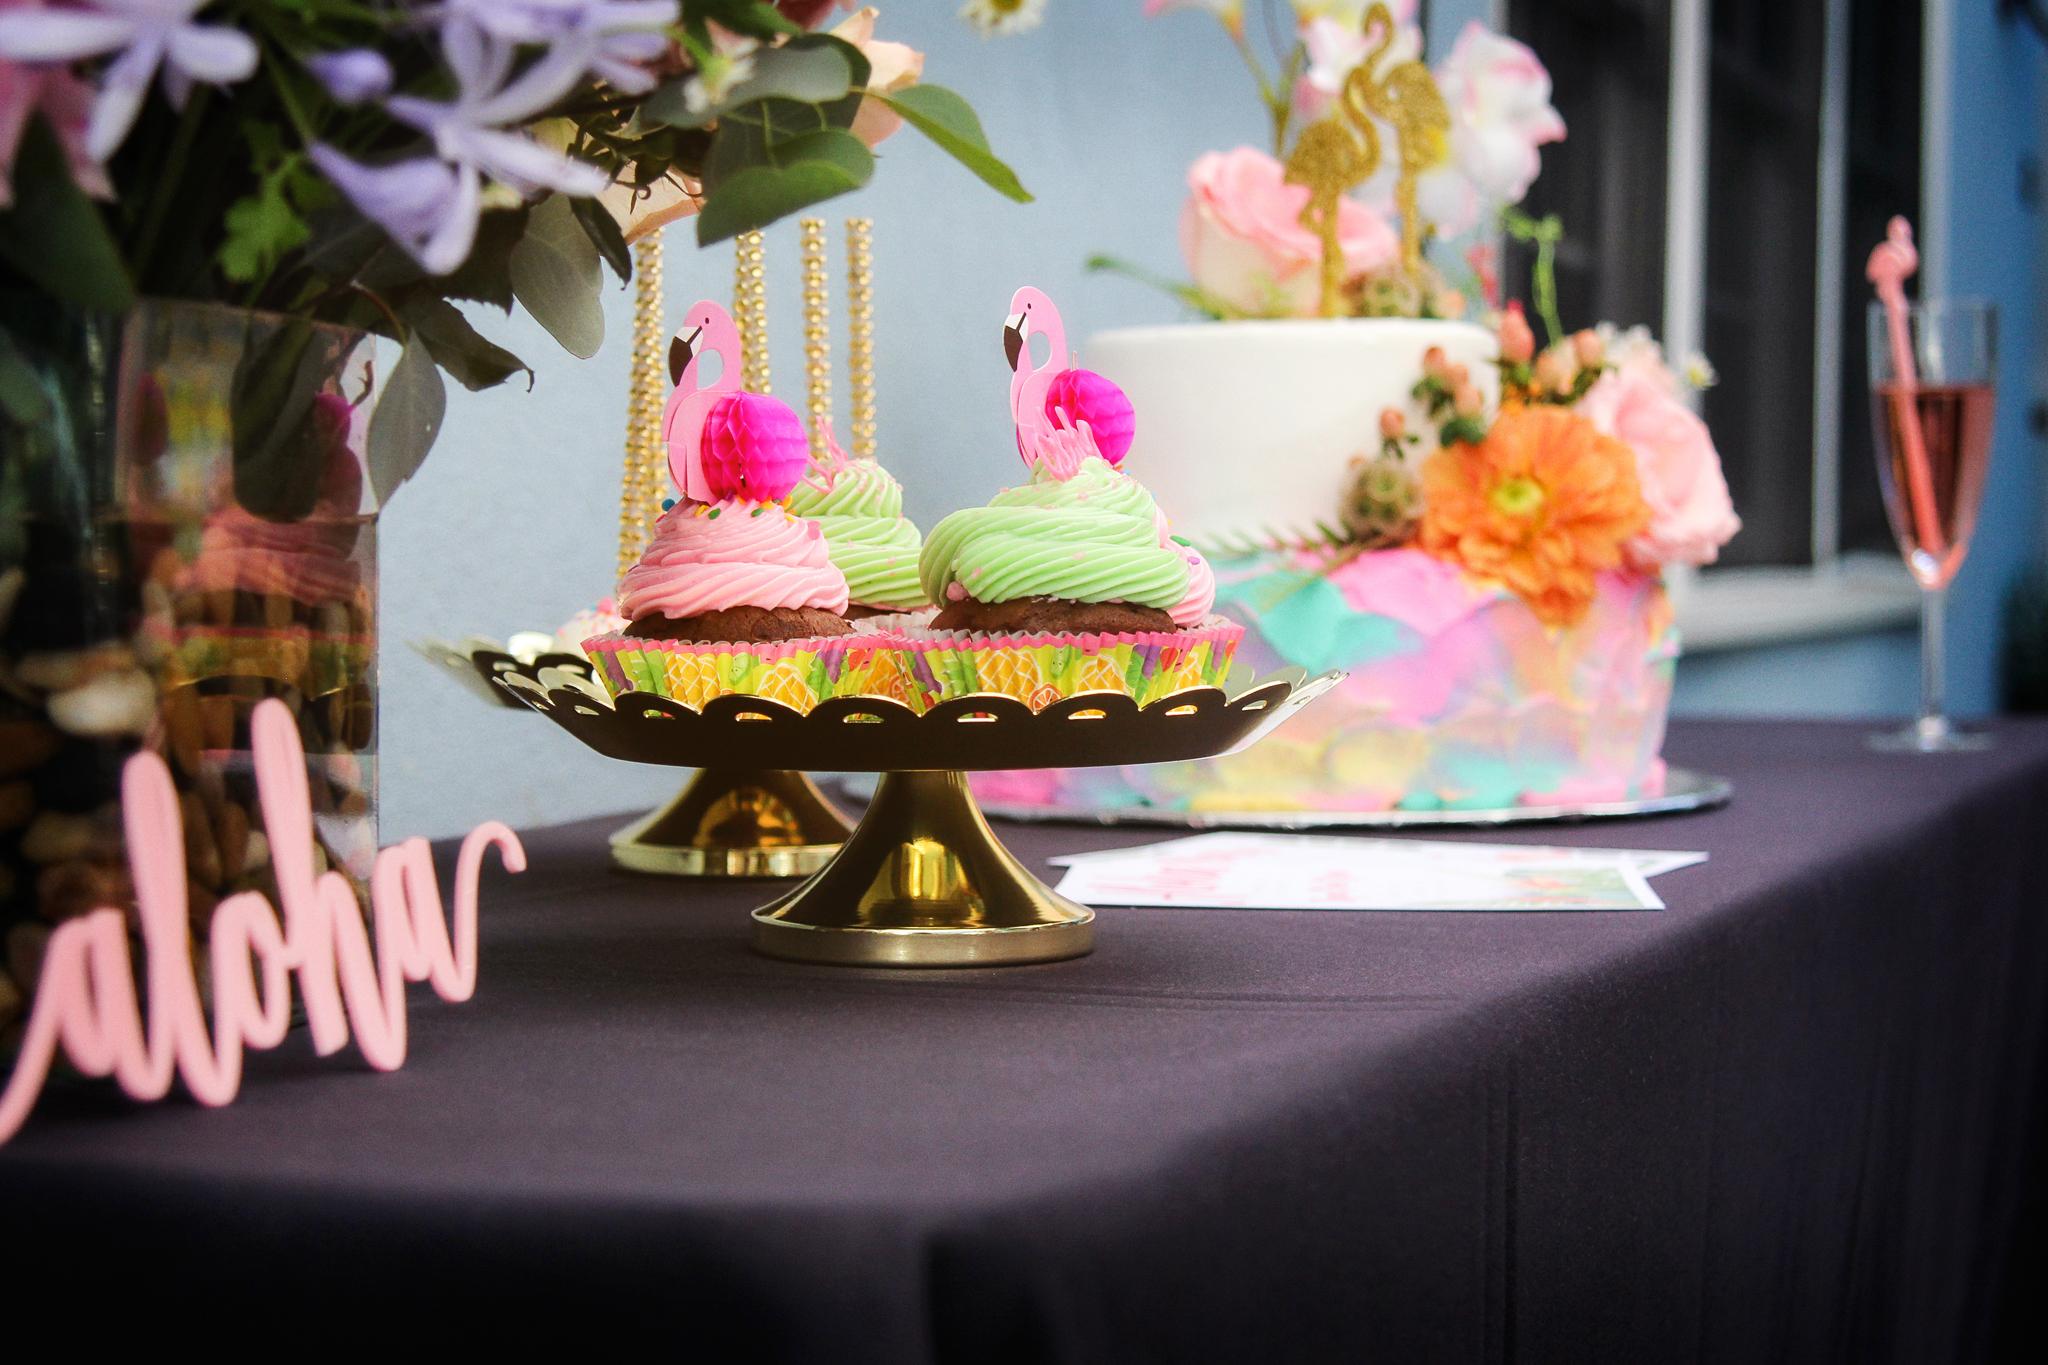 Product Lifestyle - Cakes